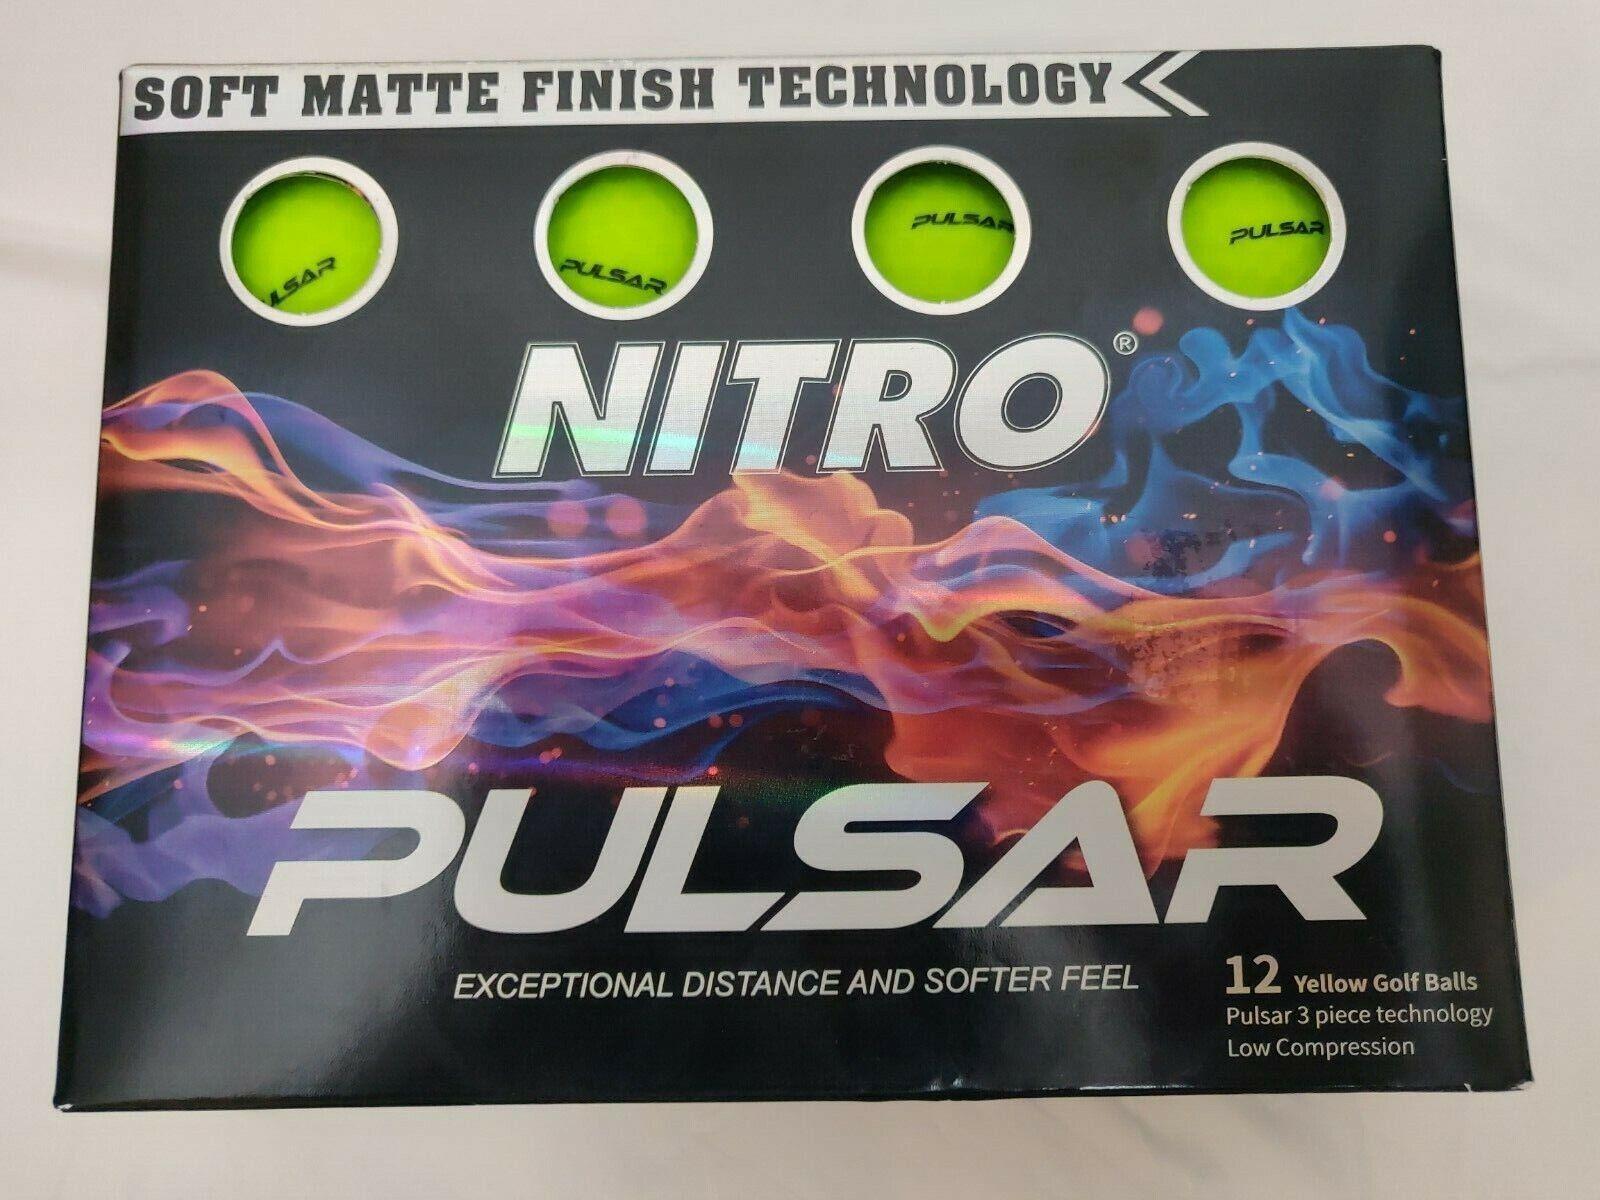 NEW Nitro Pulsar 12 Yellow Soft Matte Finish Golf Balls - Sh